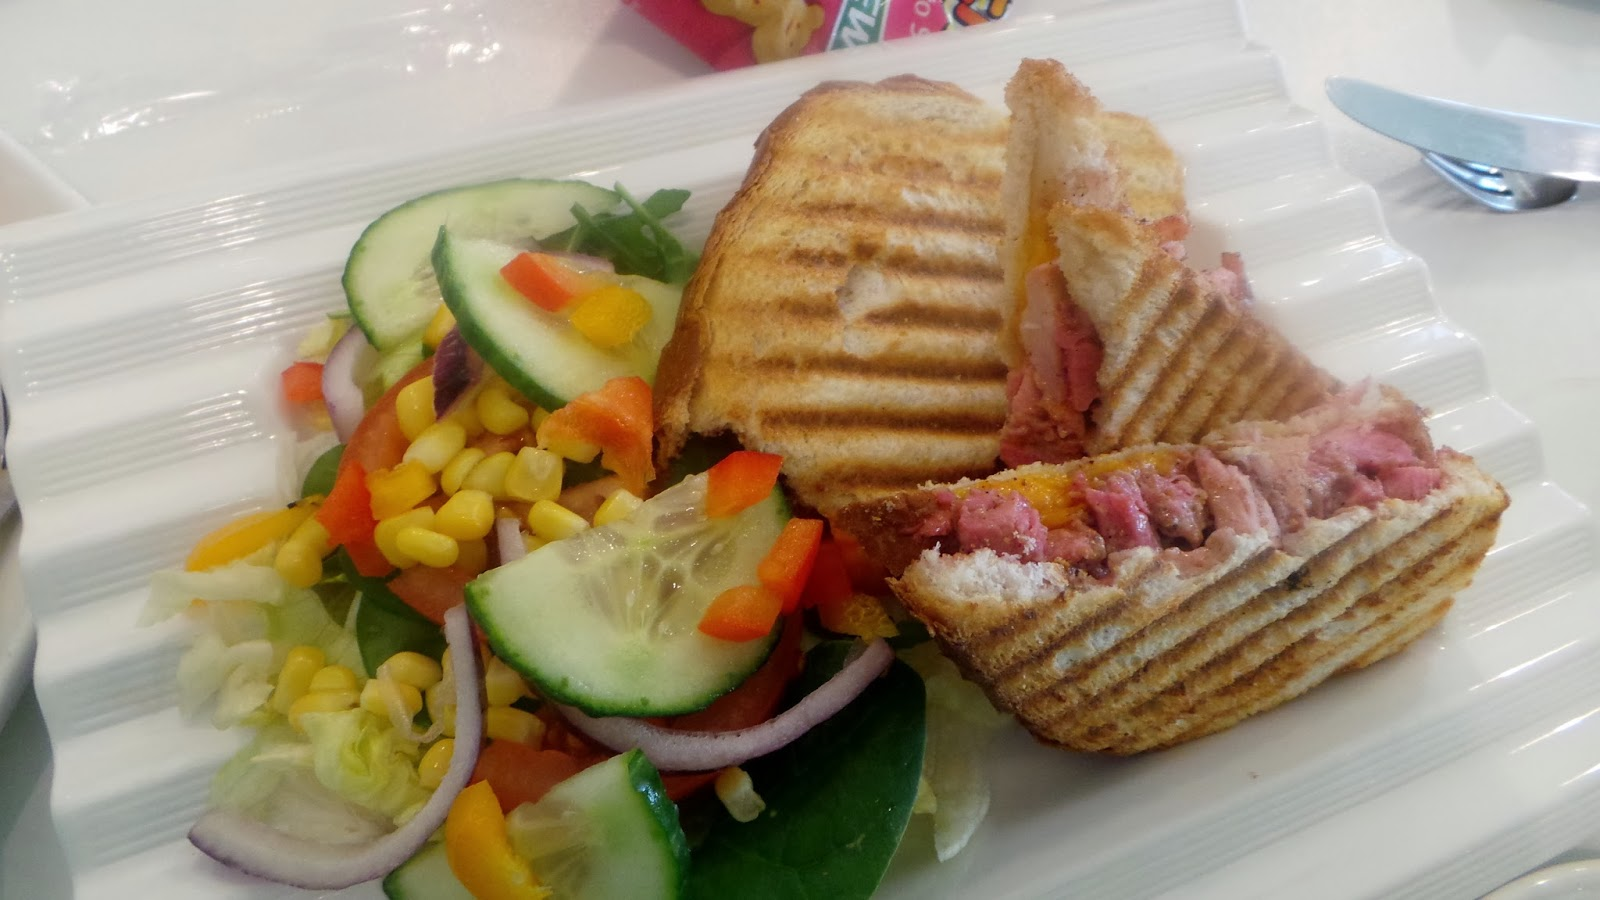 barnsley museum cafe food